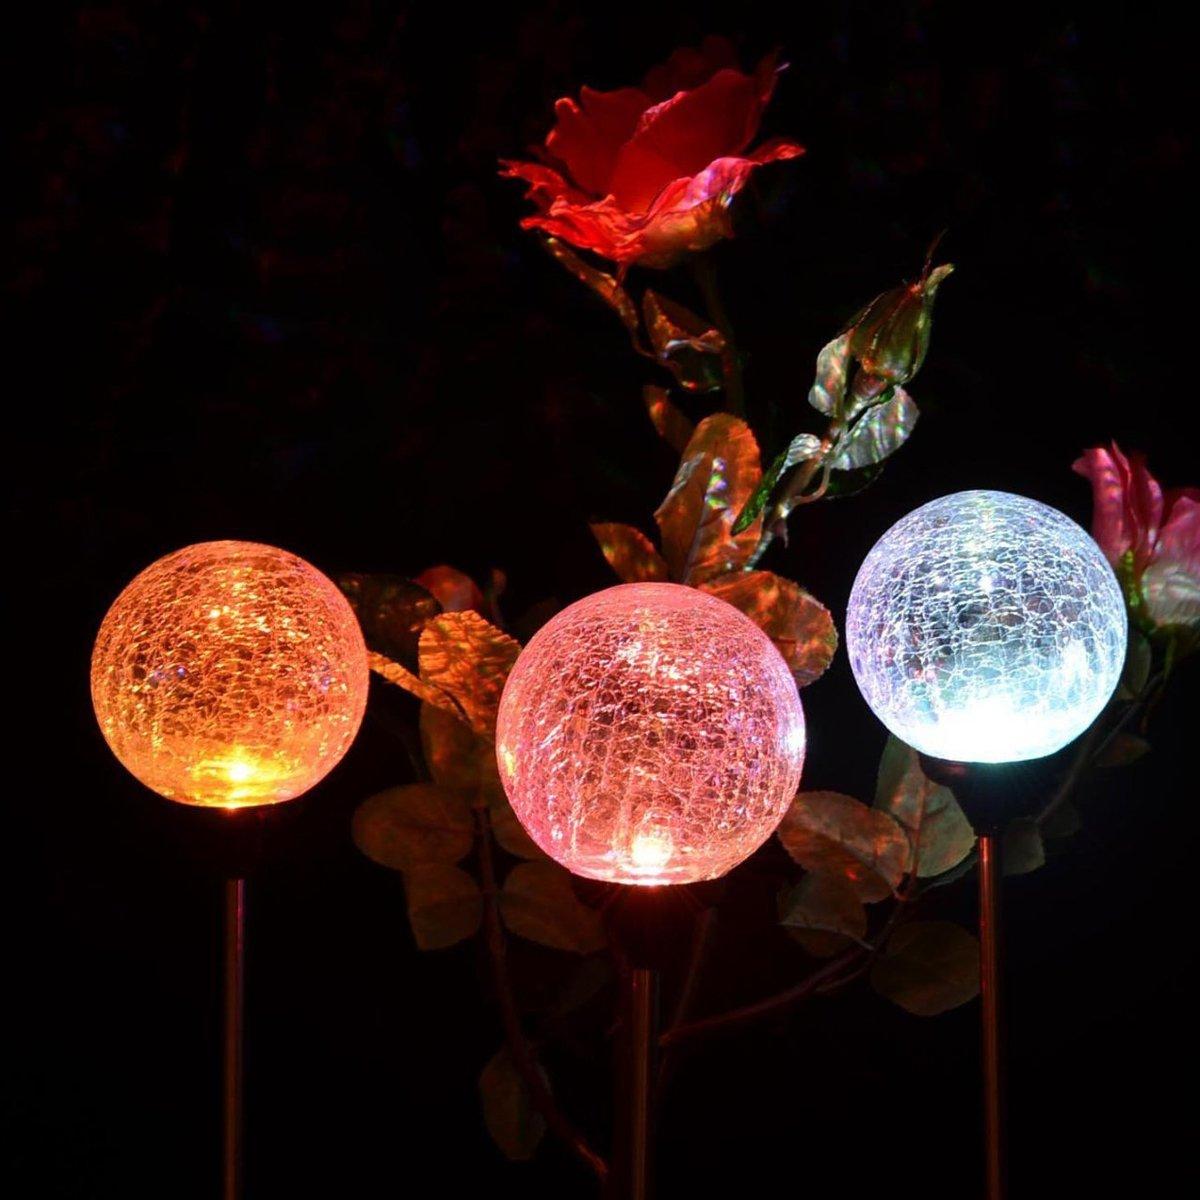 GIGALUMI Outdoor Solar Garden Lights, 3 Pack Cracked Glass Ball Solar Garden Stake Light, Solar Powered Lights Outdoor Multi-Color Changing LED Light for Garden, Patio, Backyard